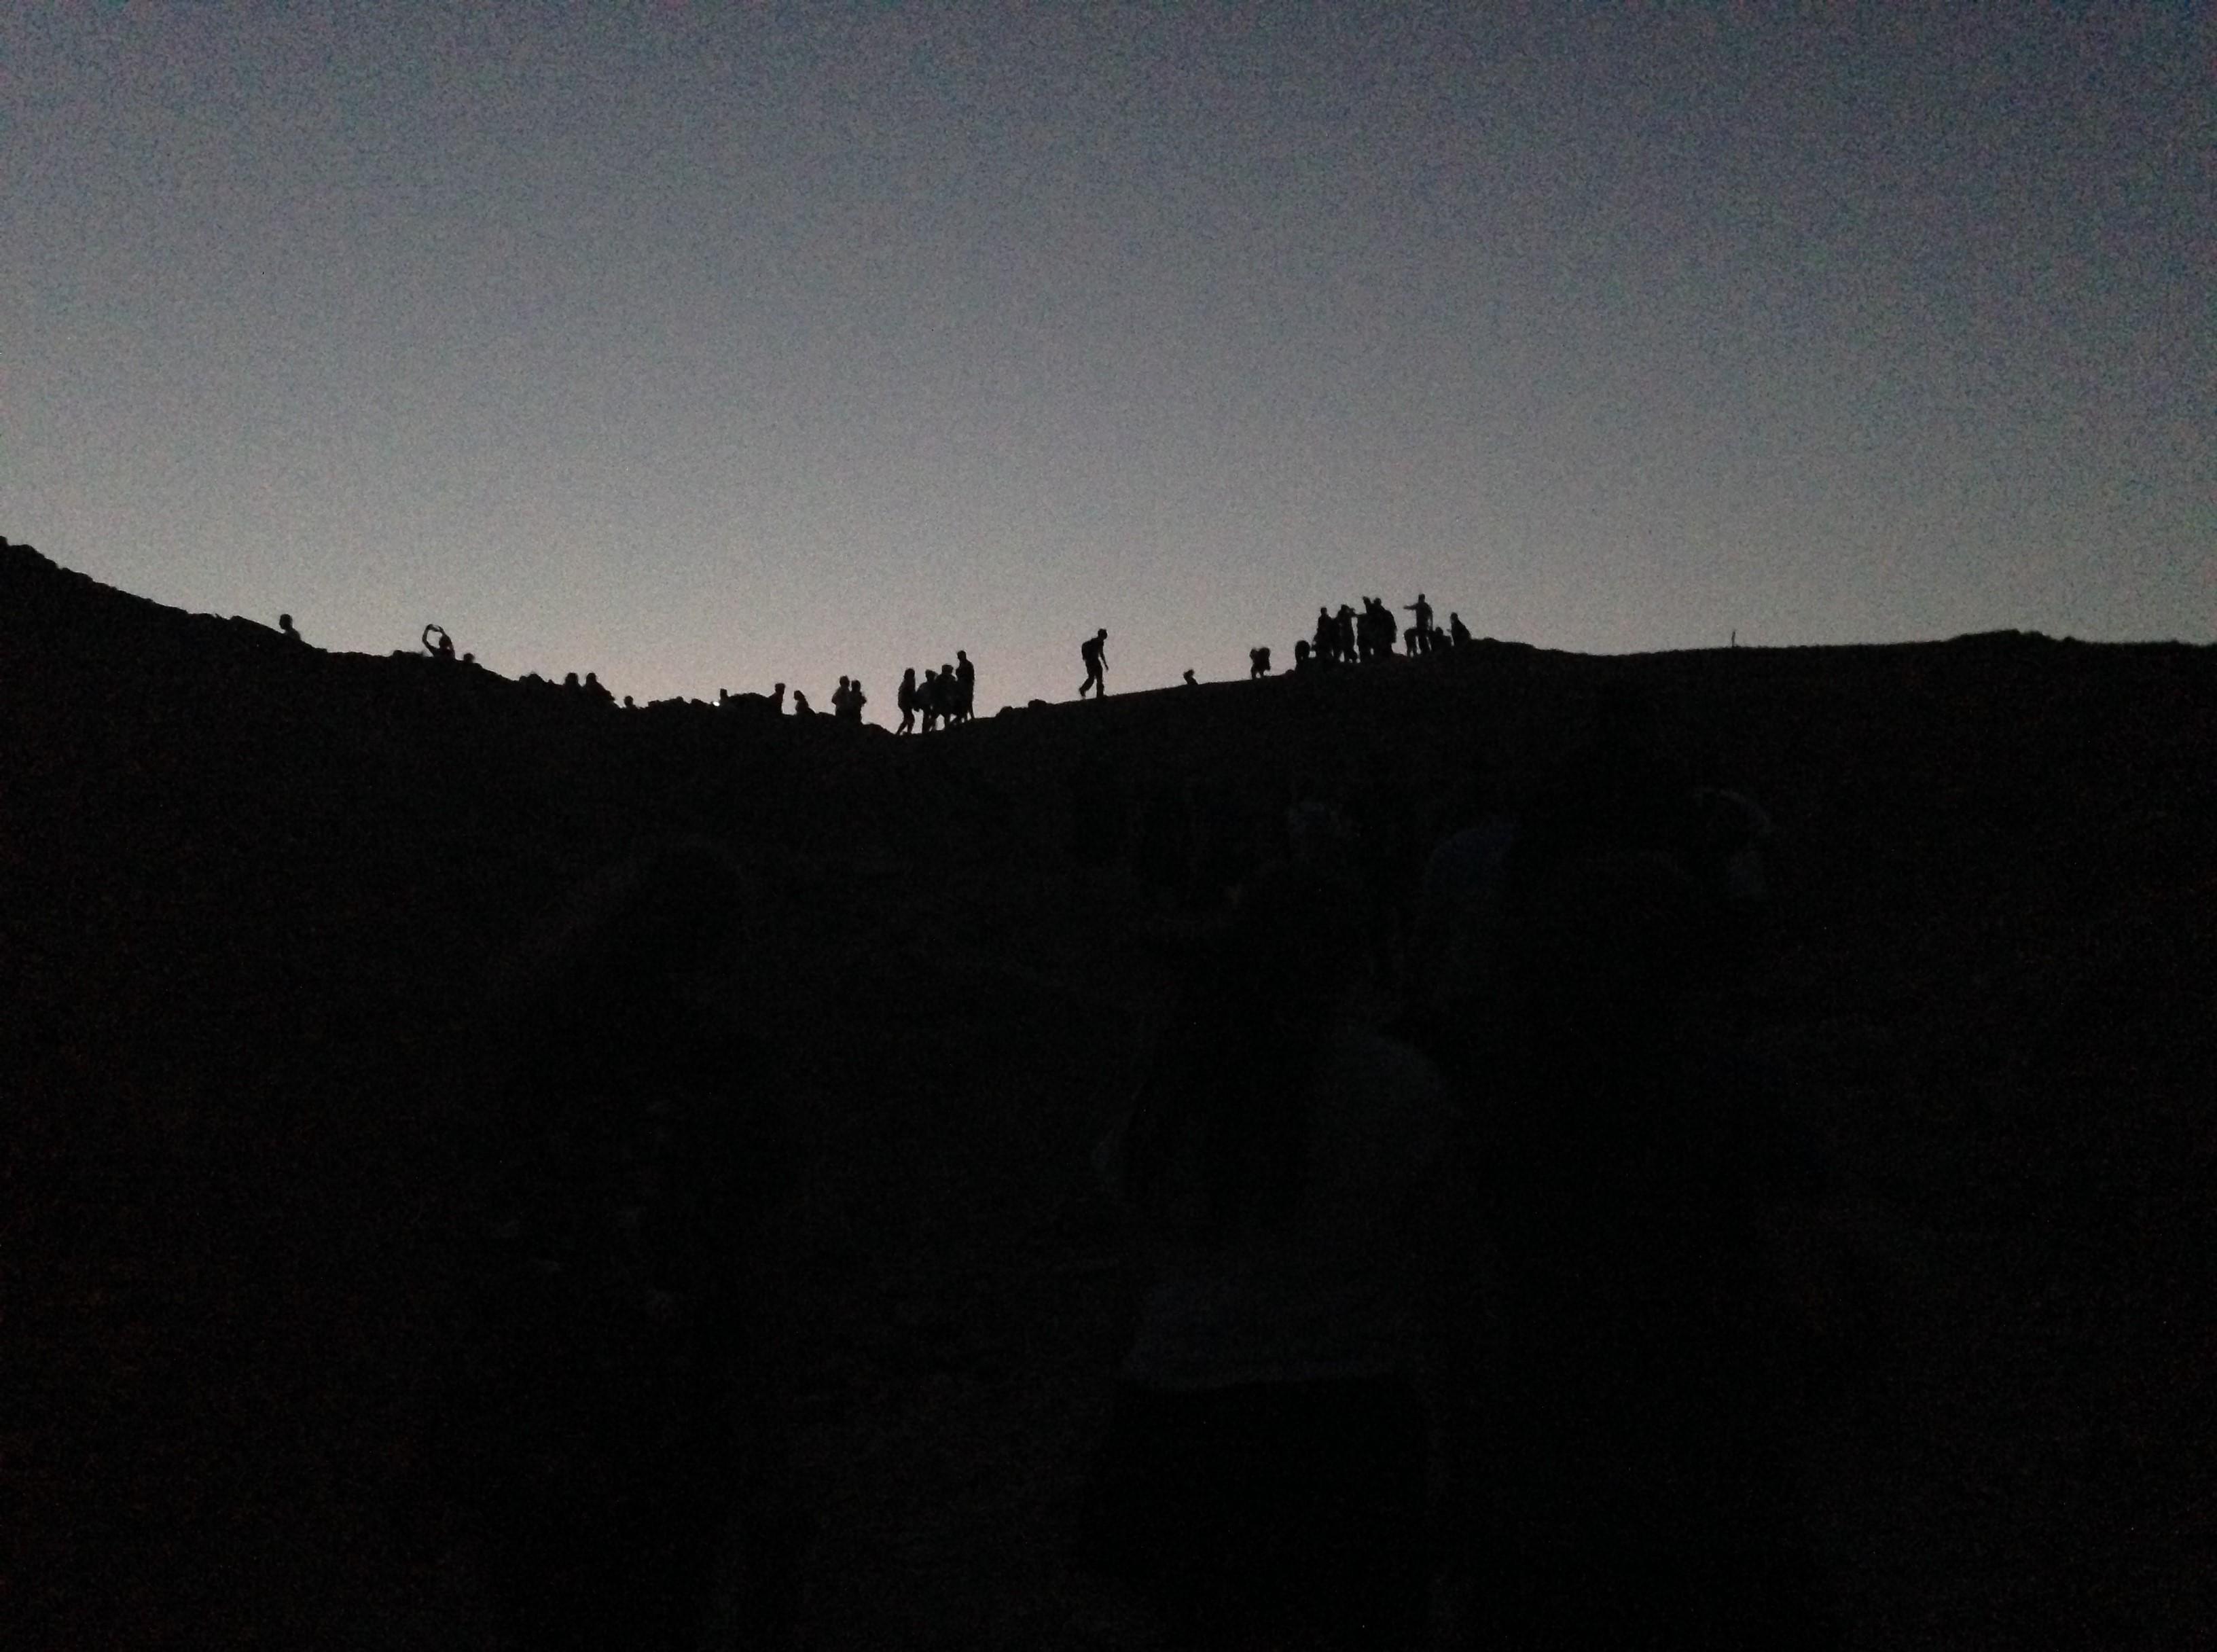 silhouette of people hiking in desert